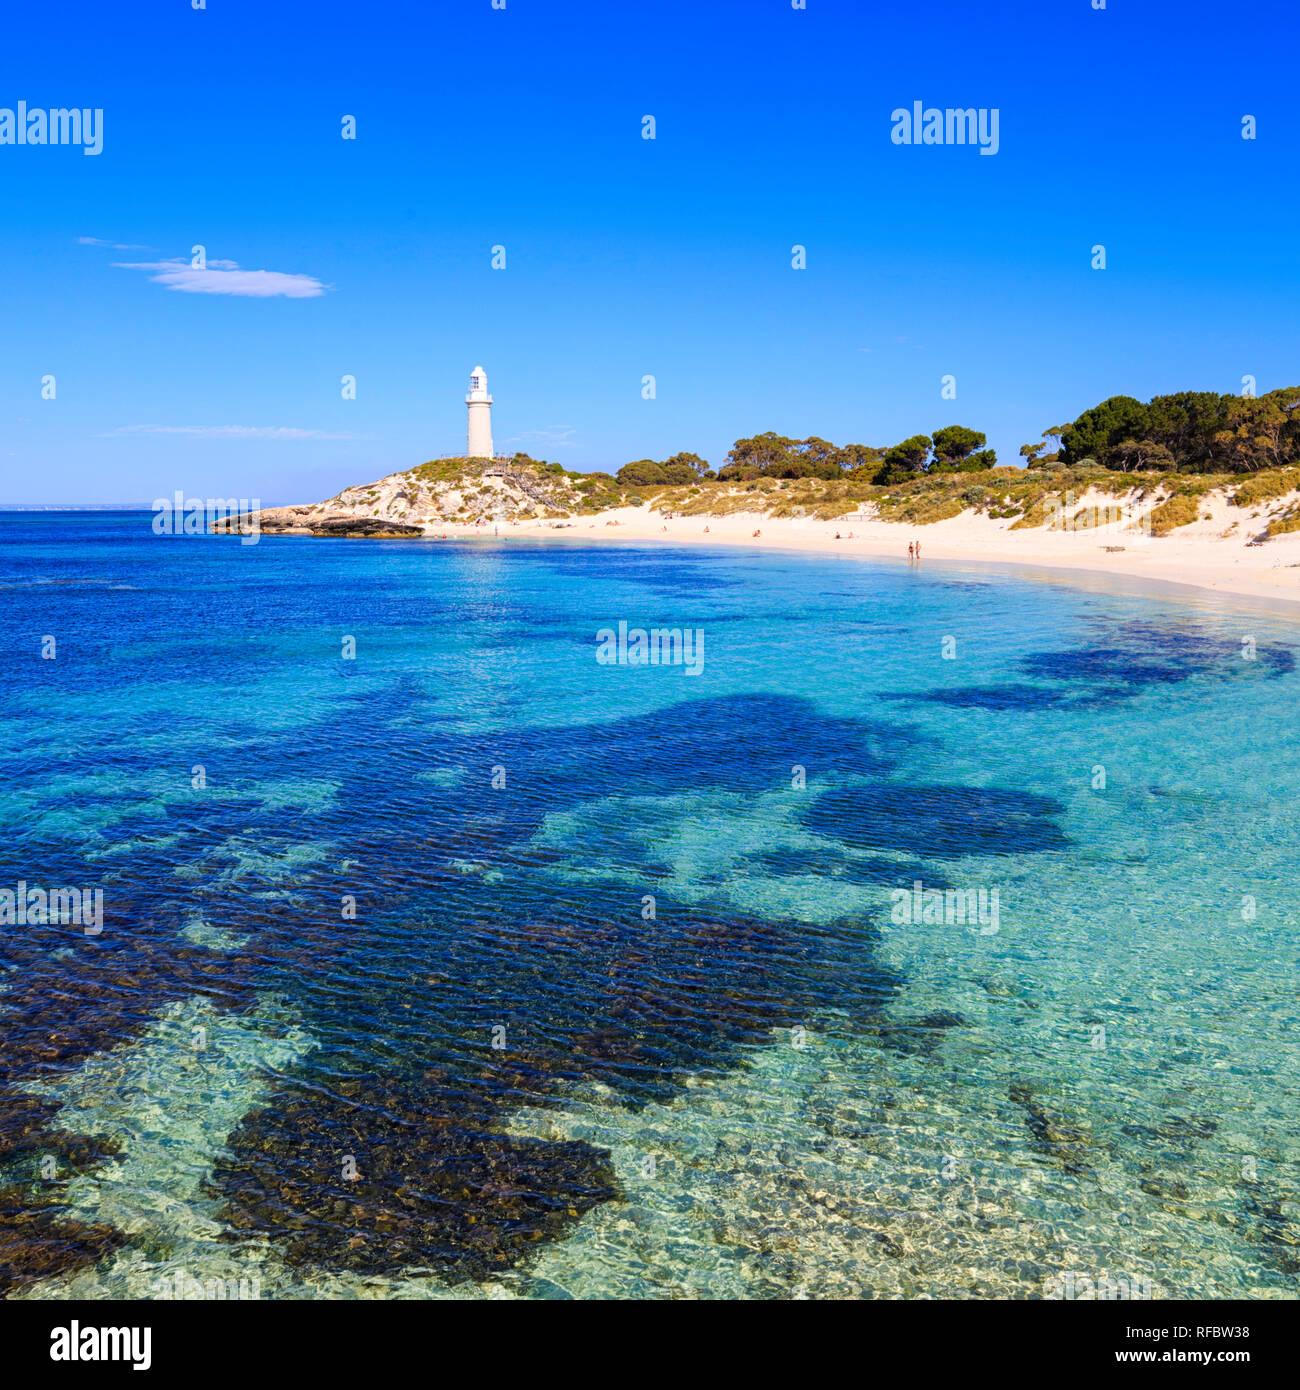 Pinky Beach and Bathurst Lighthouse - Stock Image